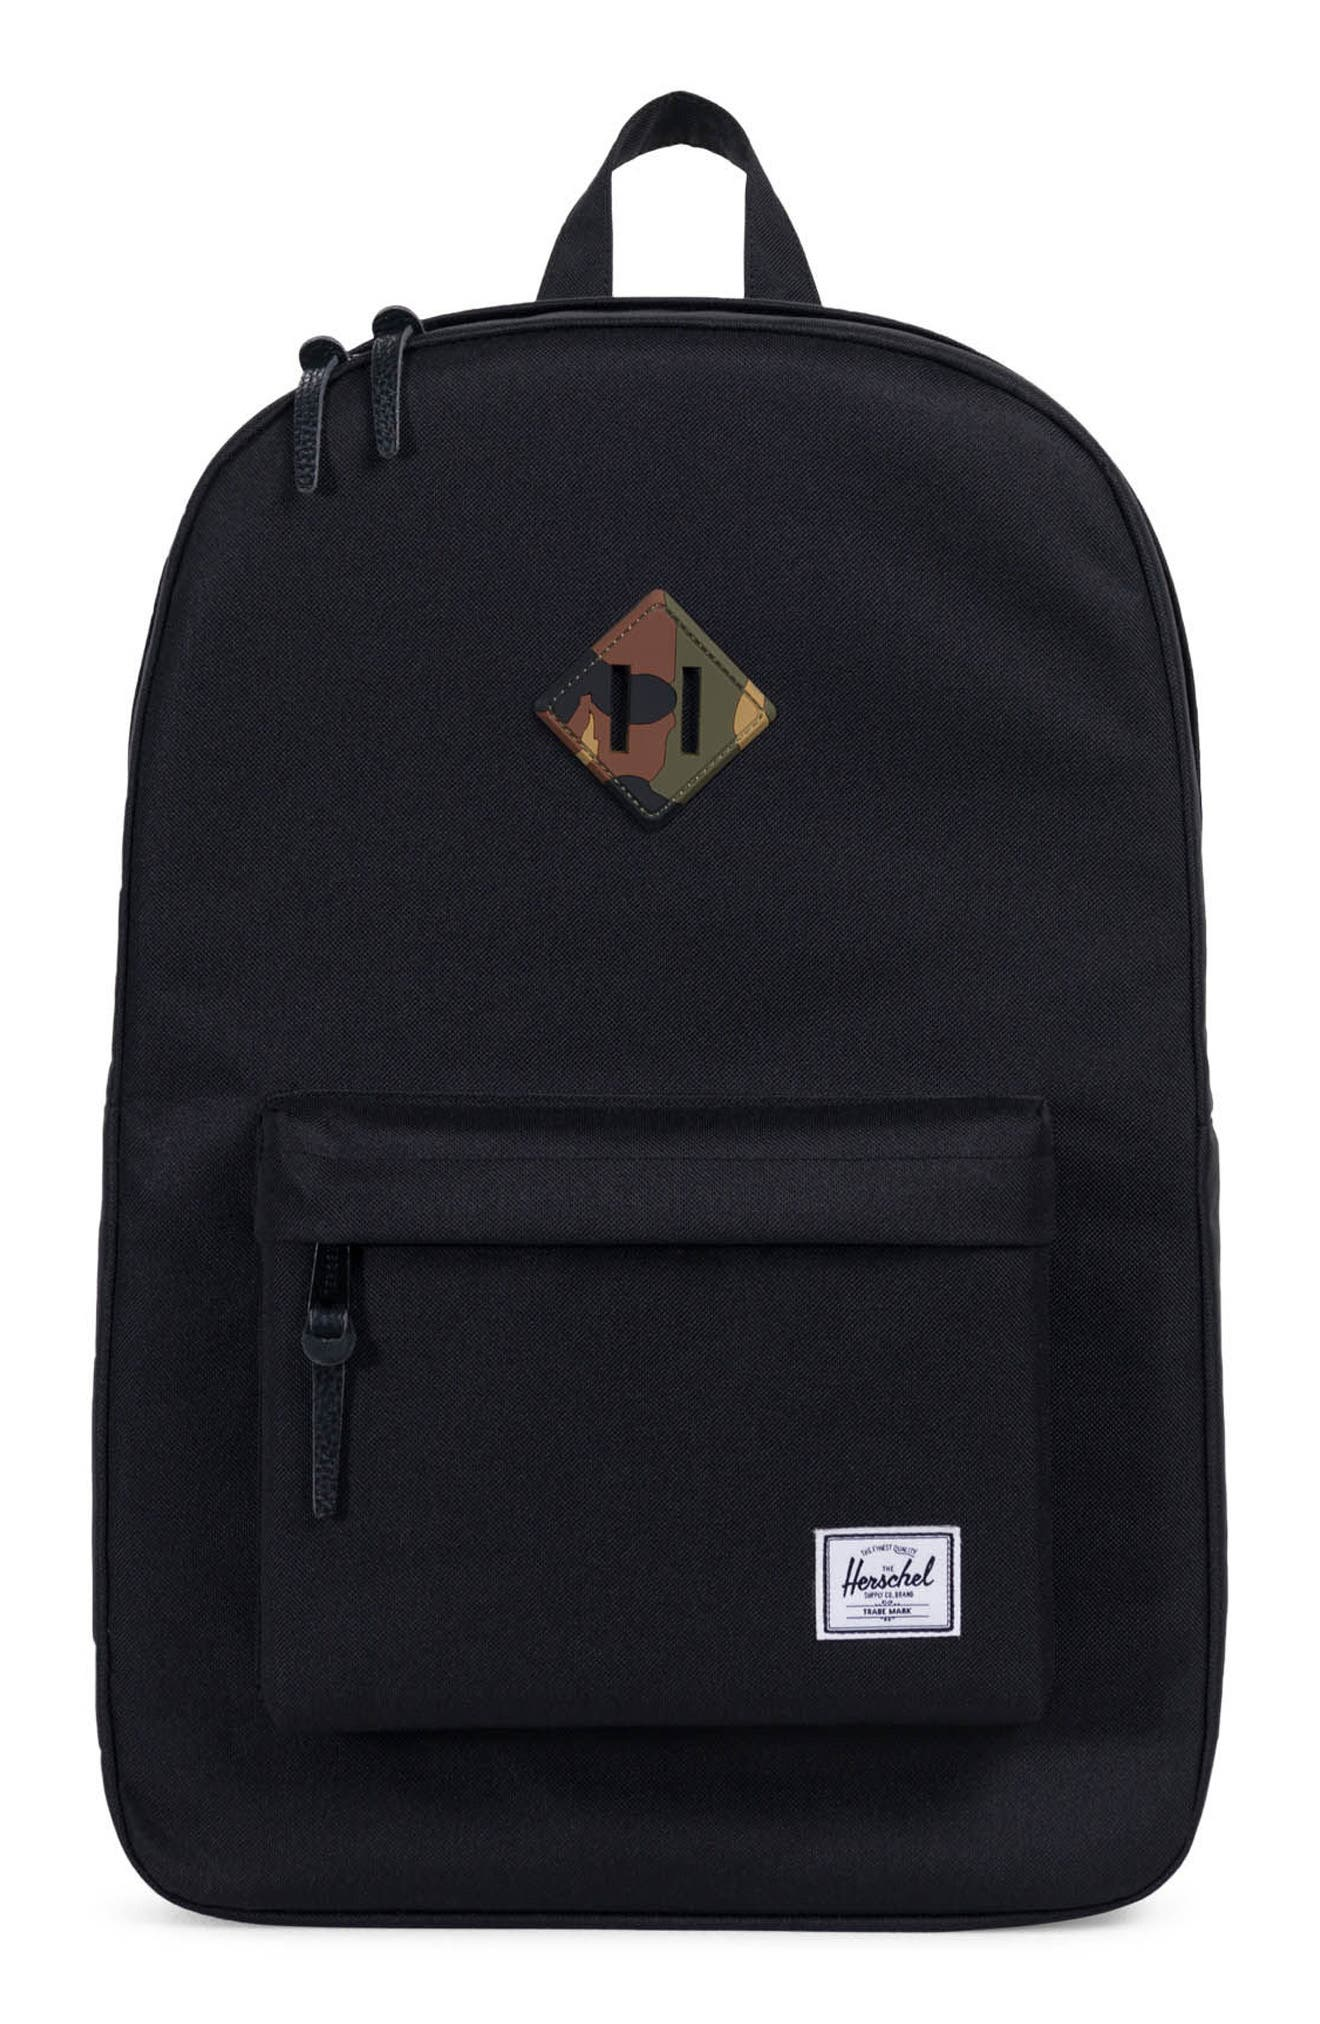 Heritage Reflective Backpack,                             Main thumbnail 1, color,                             Black/ Woodland Camo